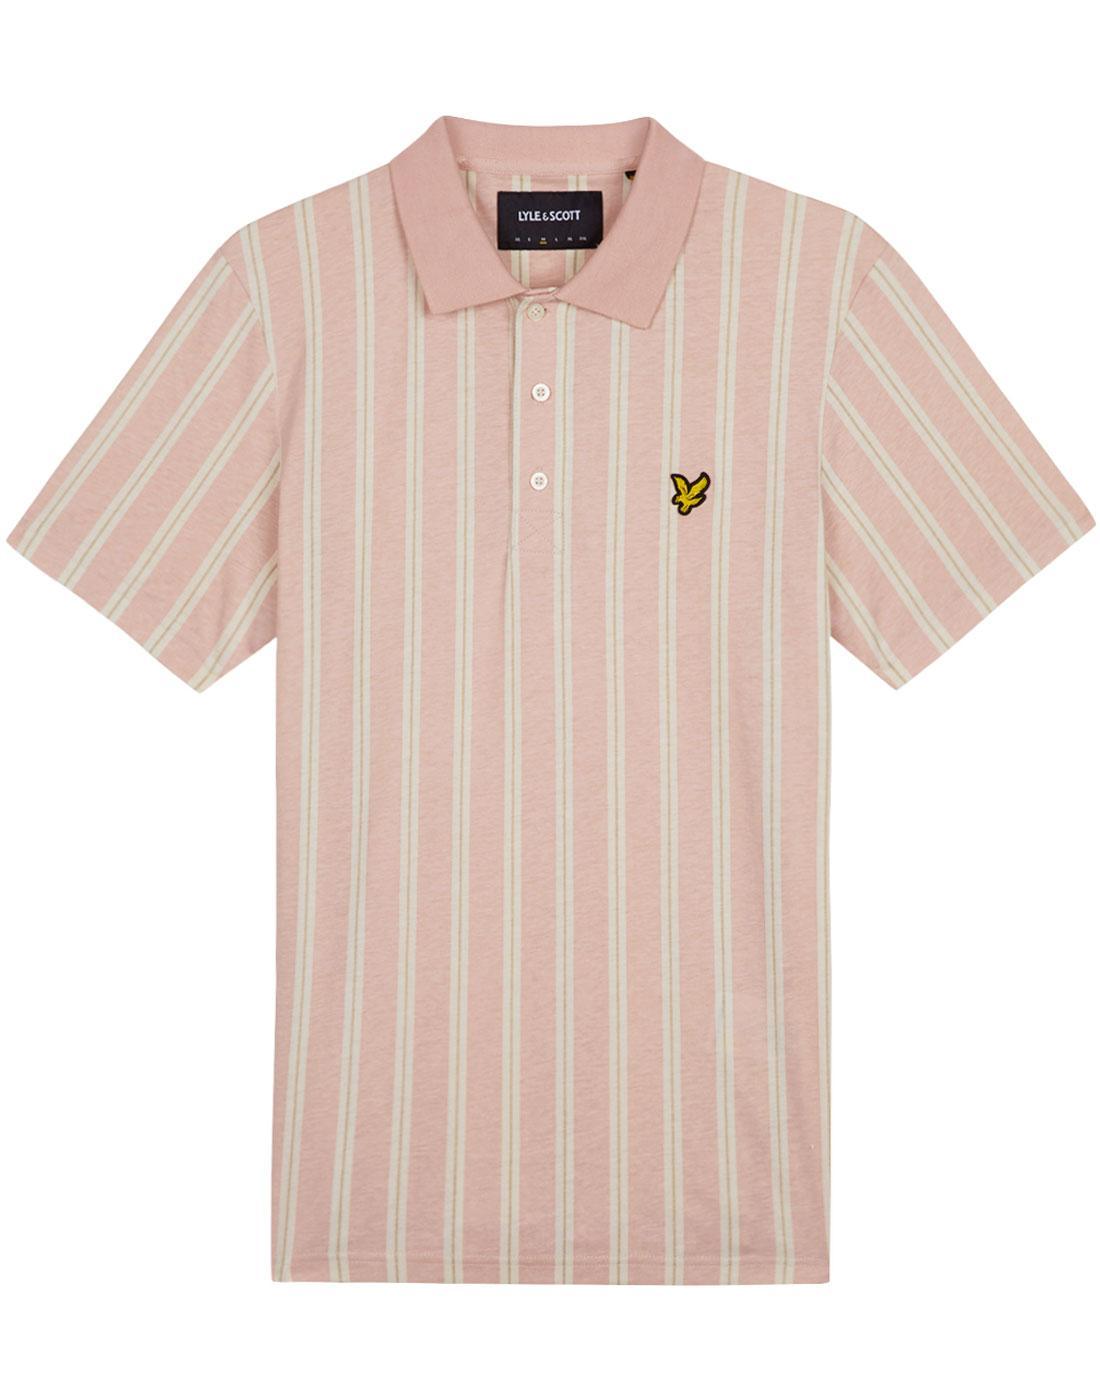 LYLE & SCOTT Mod Deckchair Stripe Polo Shirt (DP)